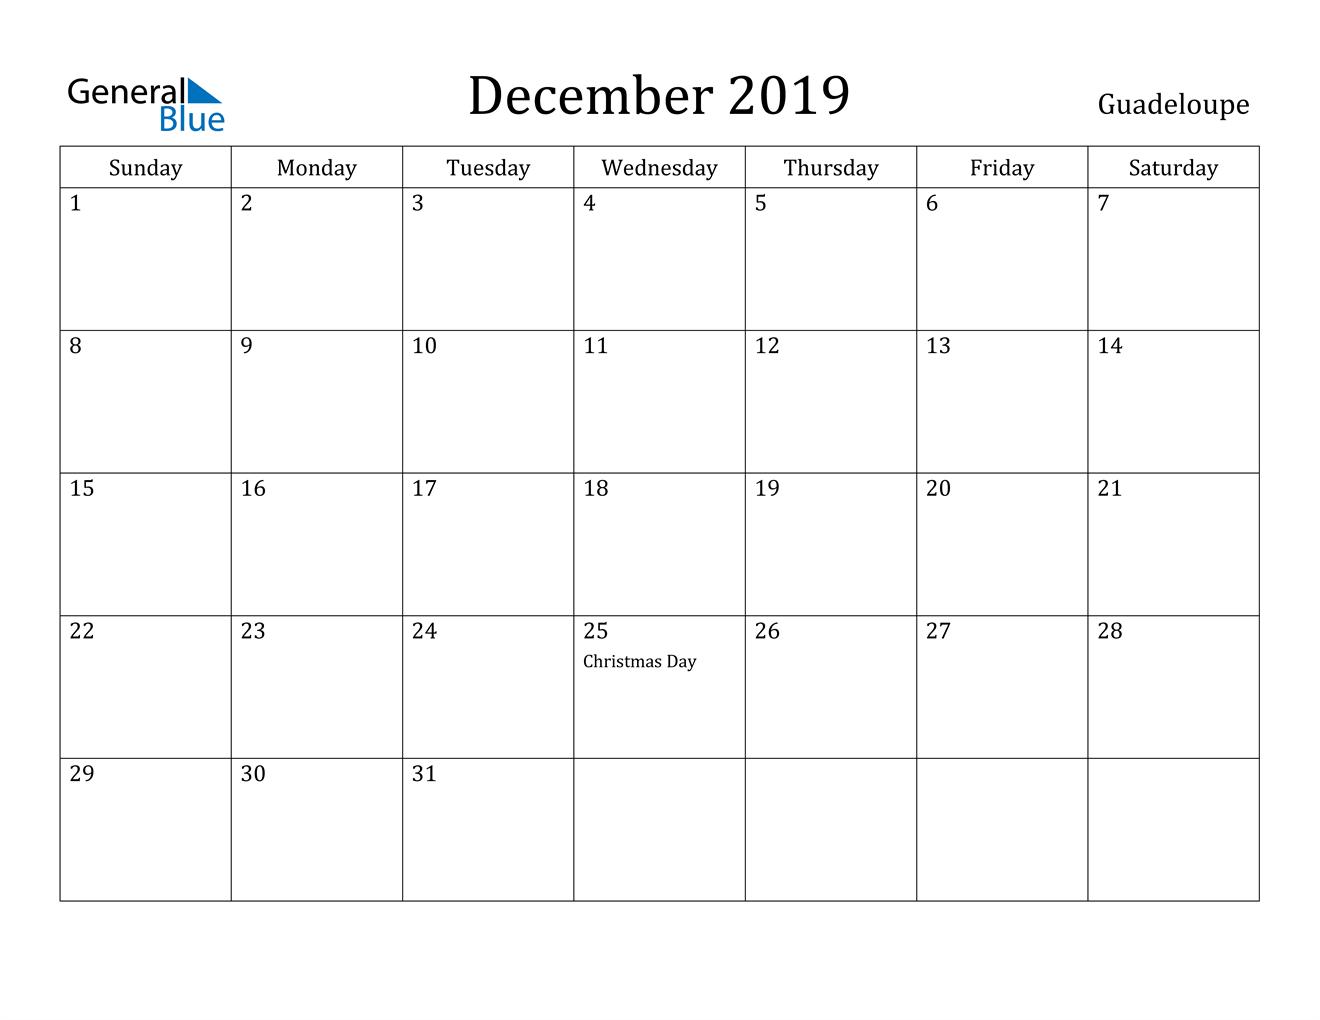 Image of December 2019 Guadeloupe Calendar with Holidays Calendar